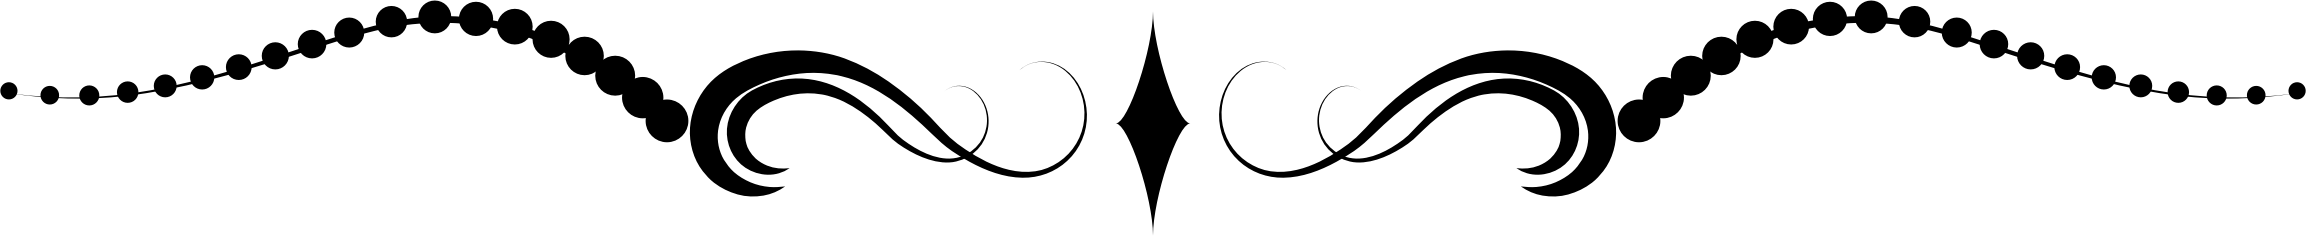 Divider PNG HD - 139013